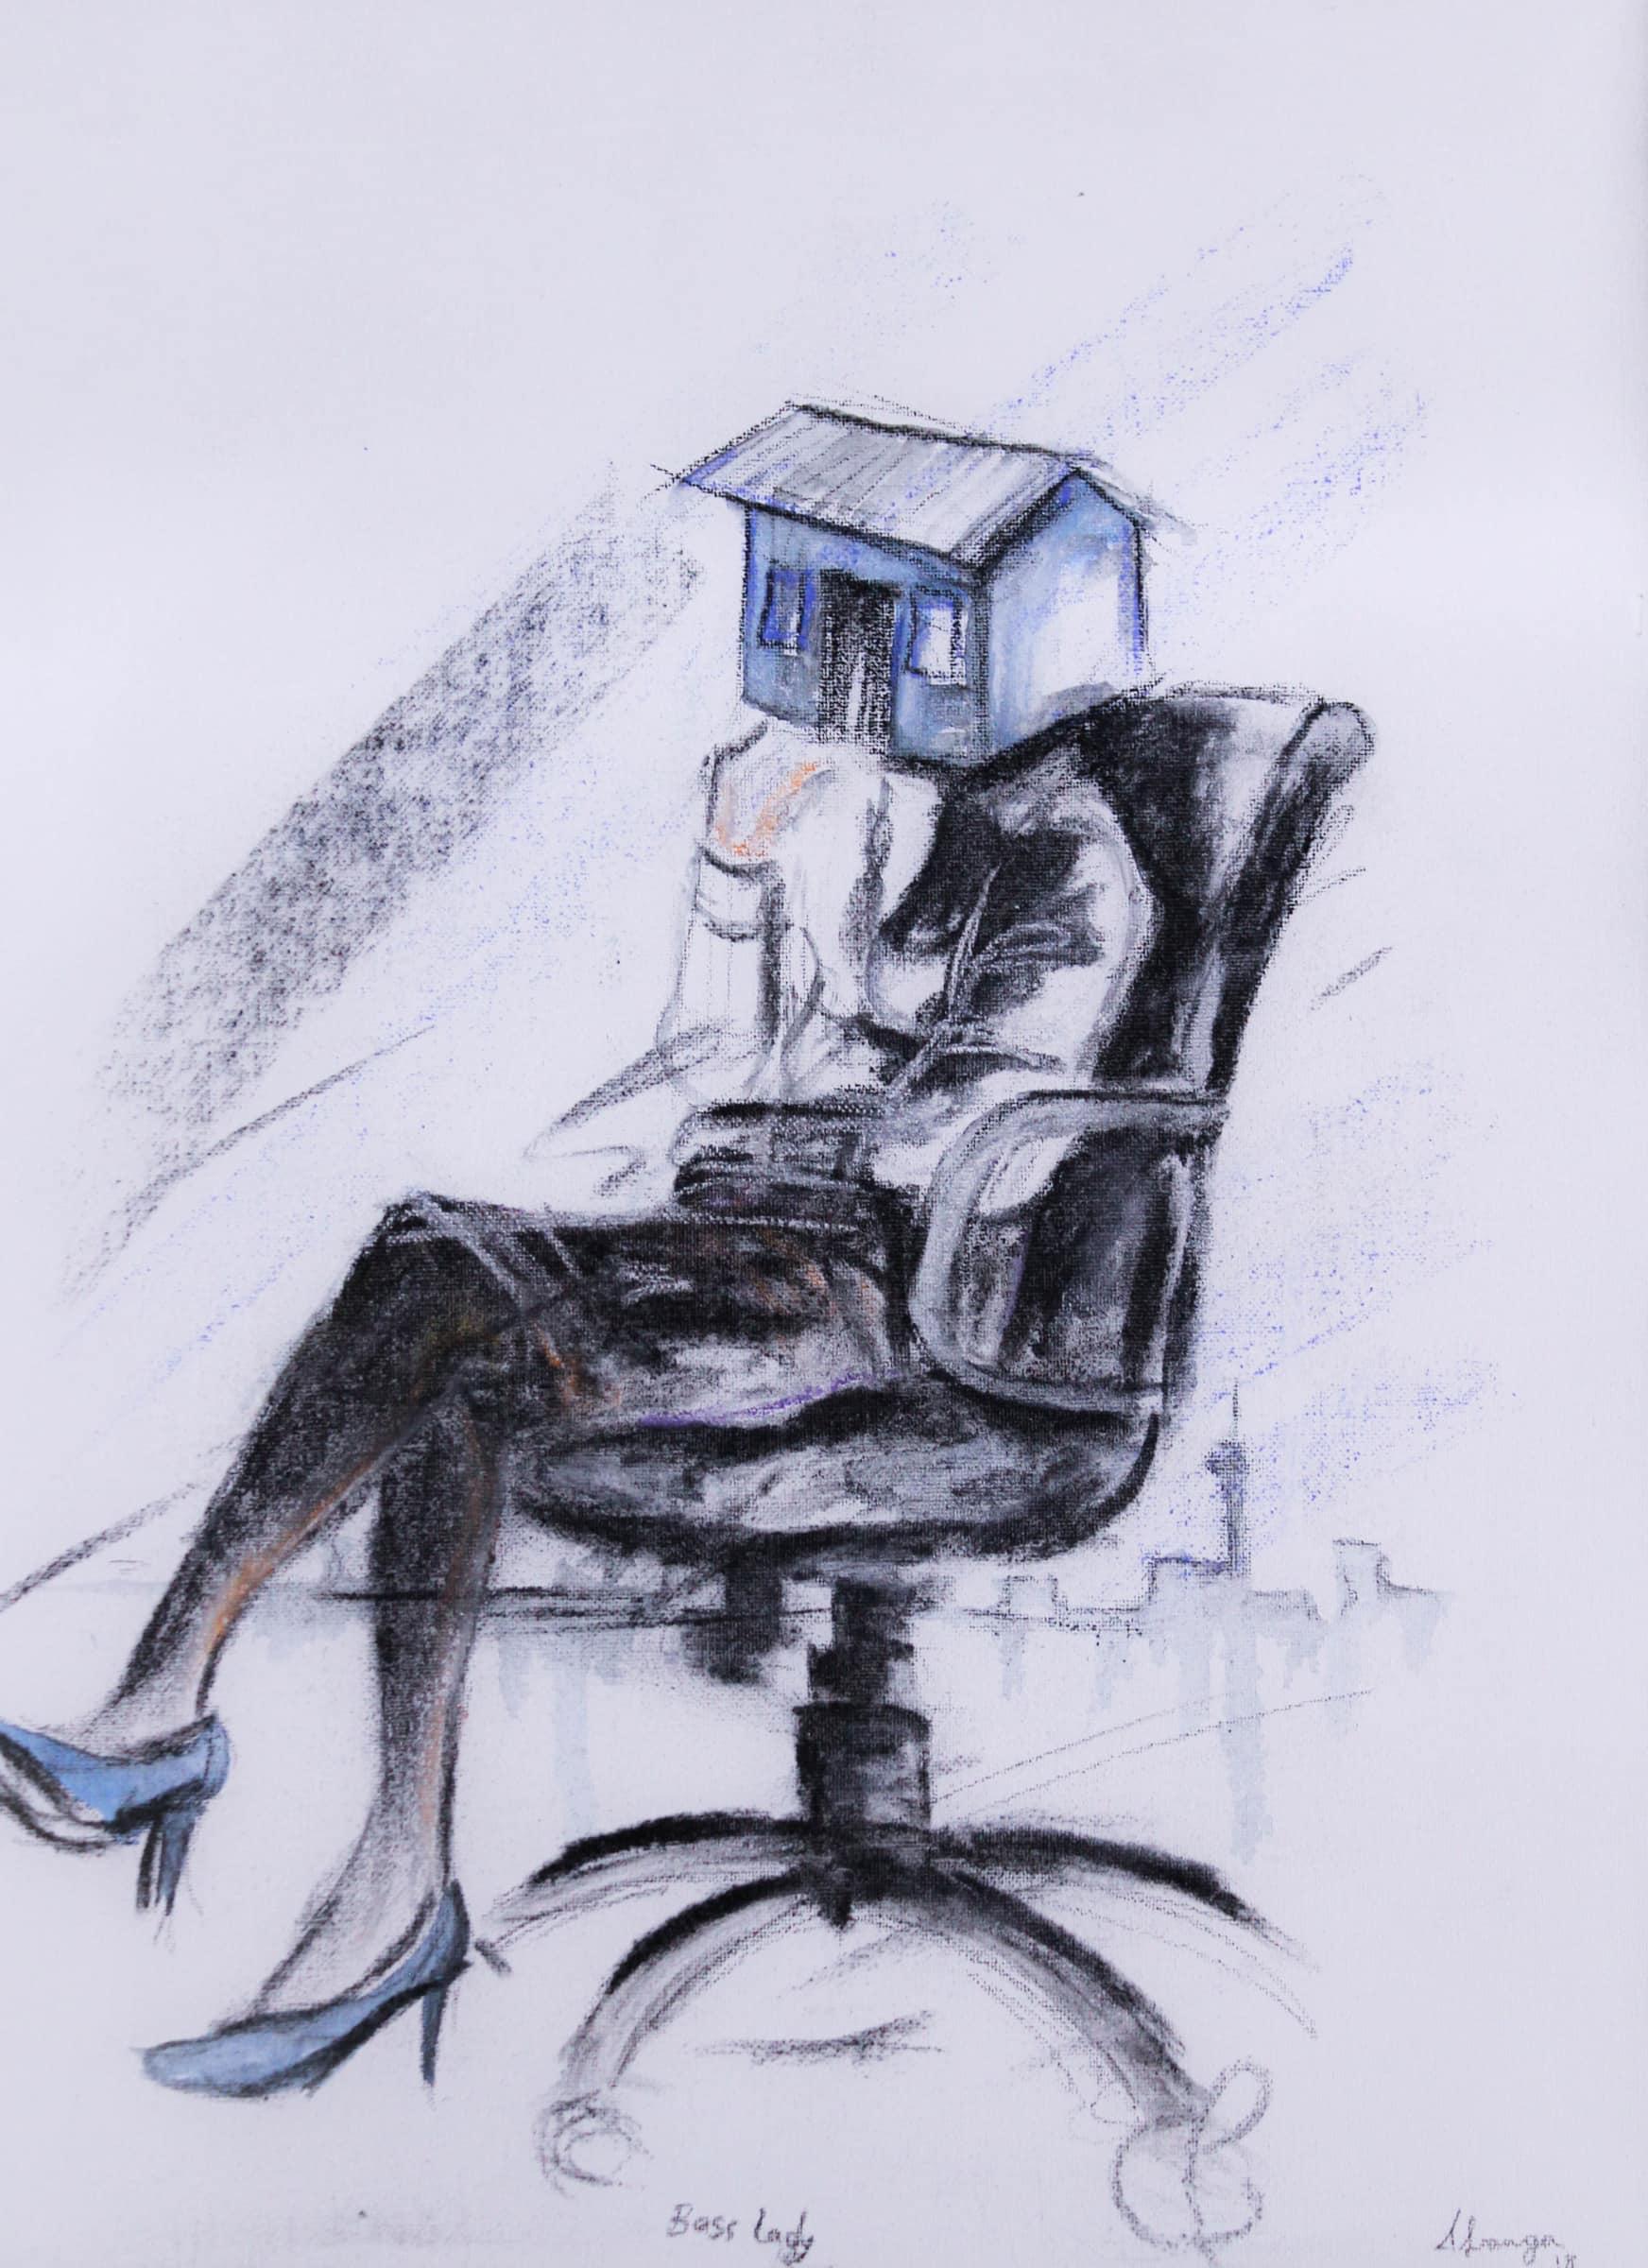 <span class=&#34;link fancybox-details-link&#34;><a href=&#34;/artists/54-azael-langa/works/2118-azael-langa-boss-lady-2018/&#34;>View Detail Page</a></span><div class=&#34;artist&#34;><strong>Azael Langa</strong></div> <div class=&#34;title&#34;><em>Boss Lady</em>, 2018</div> <div class=&#34;medium&#34;>Mixed Media On Fabriano Paper</div> <div class=&#34;dimensions&#34;>51cm x 40cm (65cm x 54cm framed)</div>